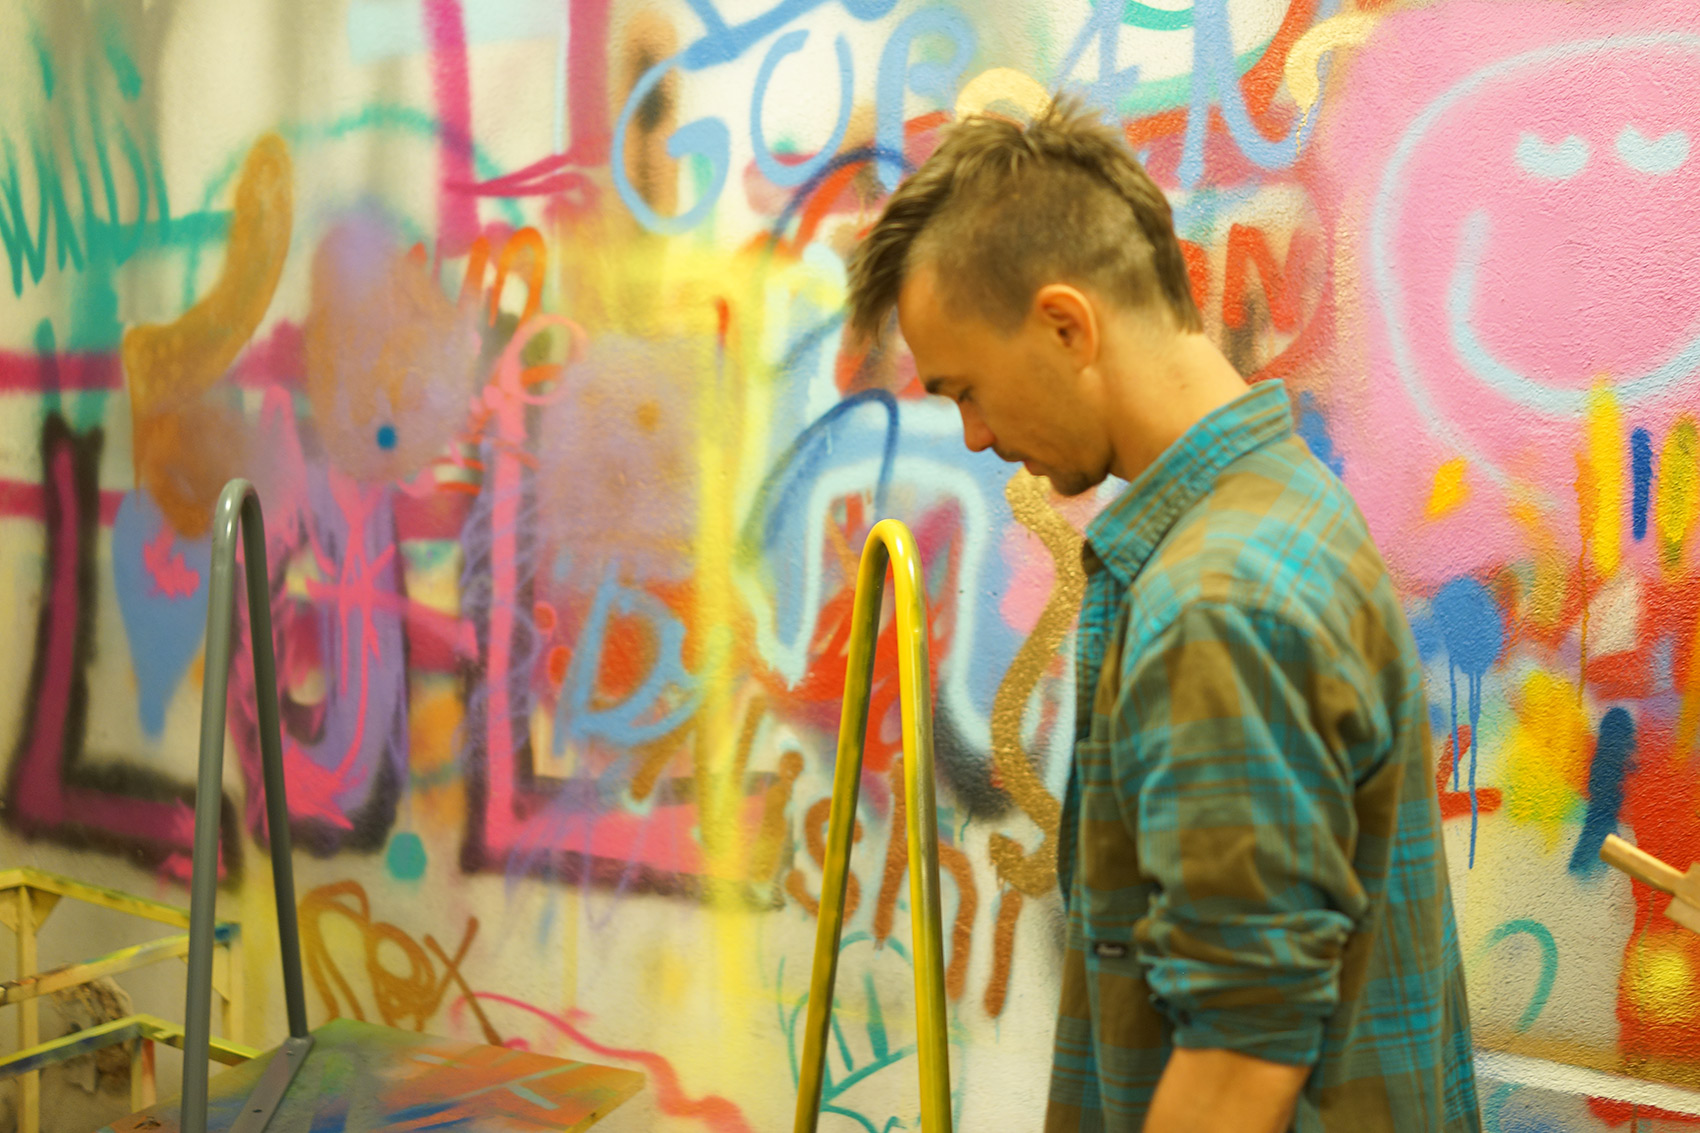 emanuel ehgartner, artist, munchies art club